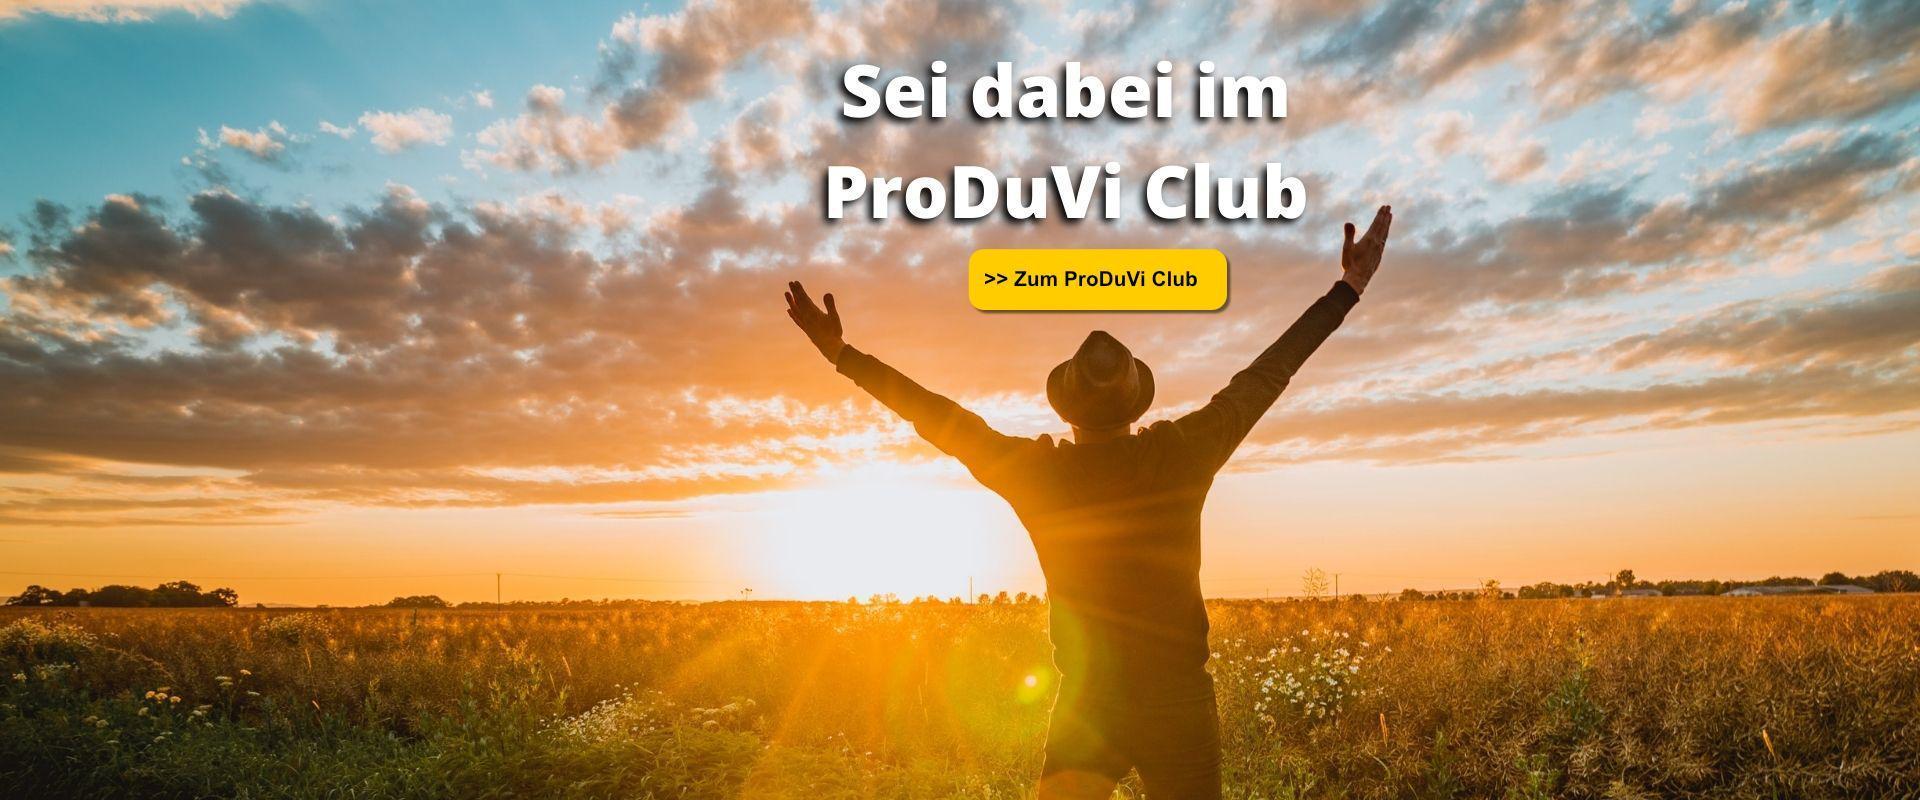 ProDuVi Club